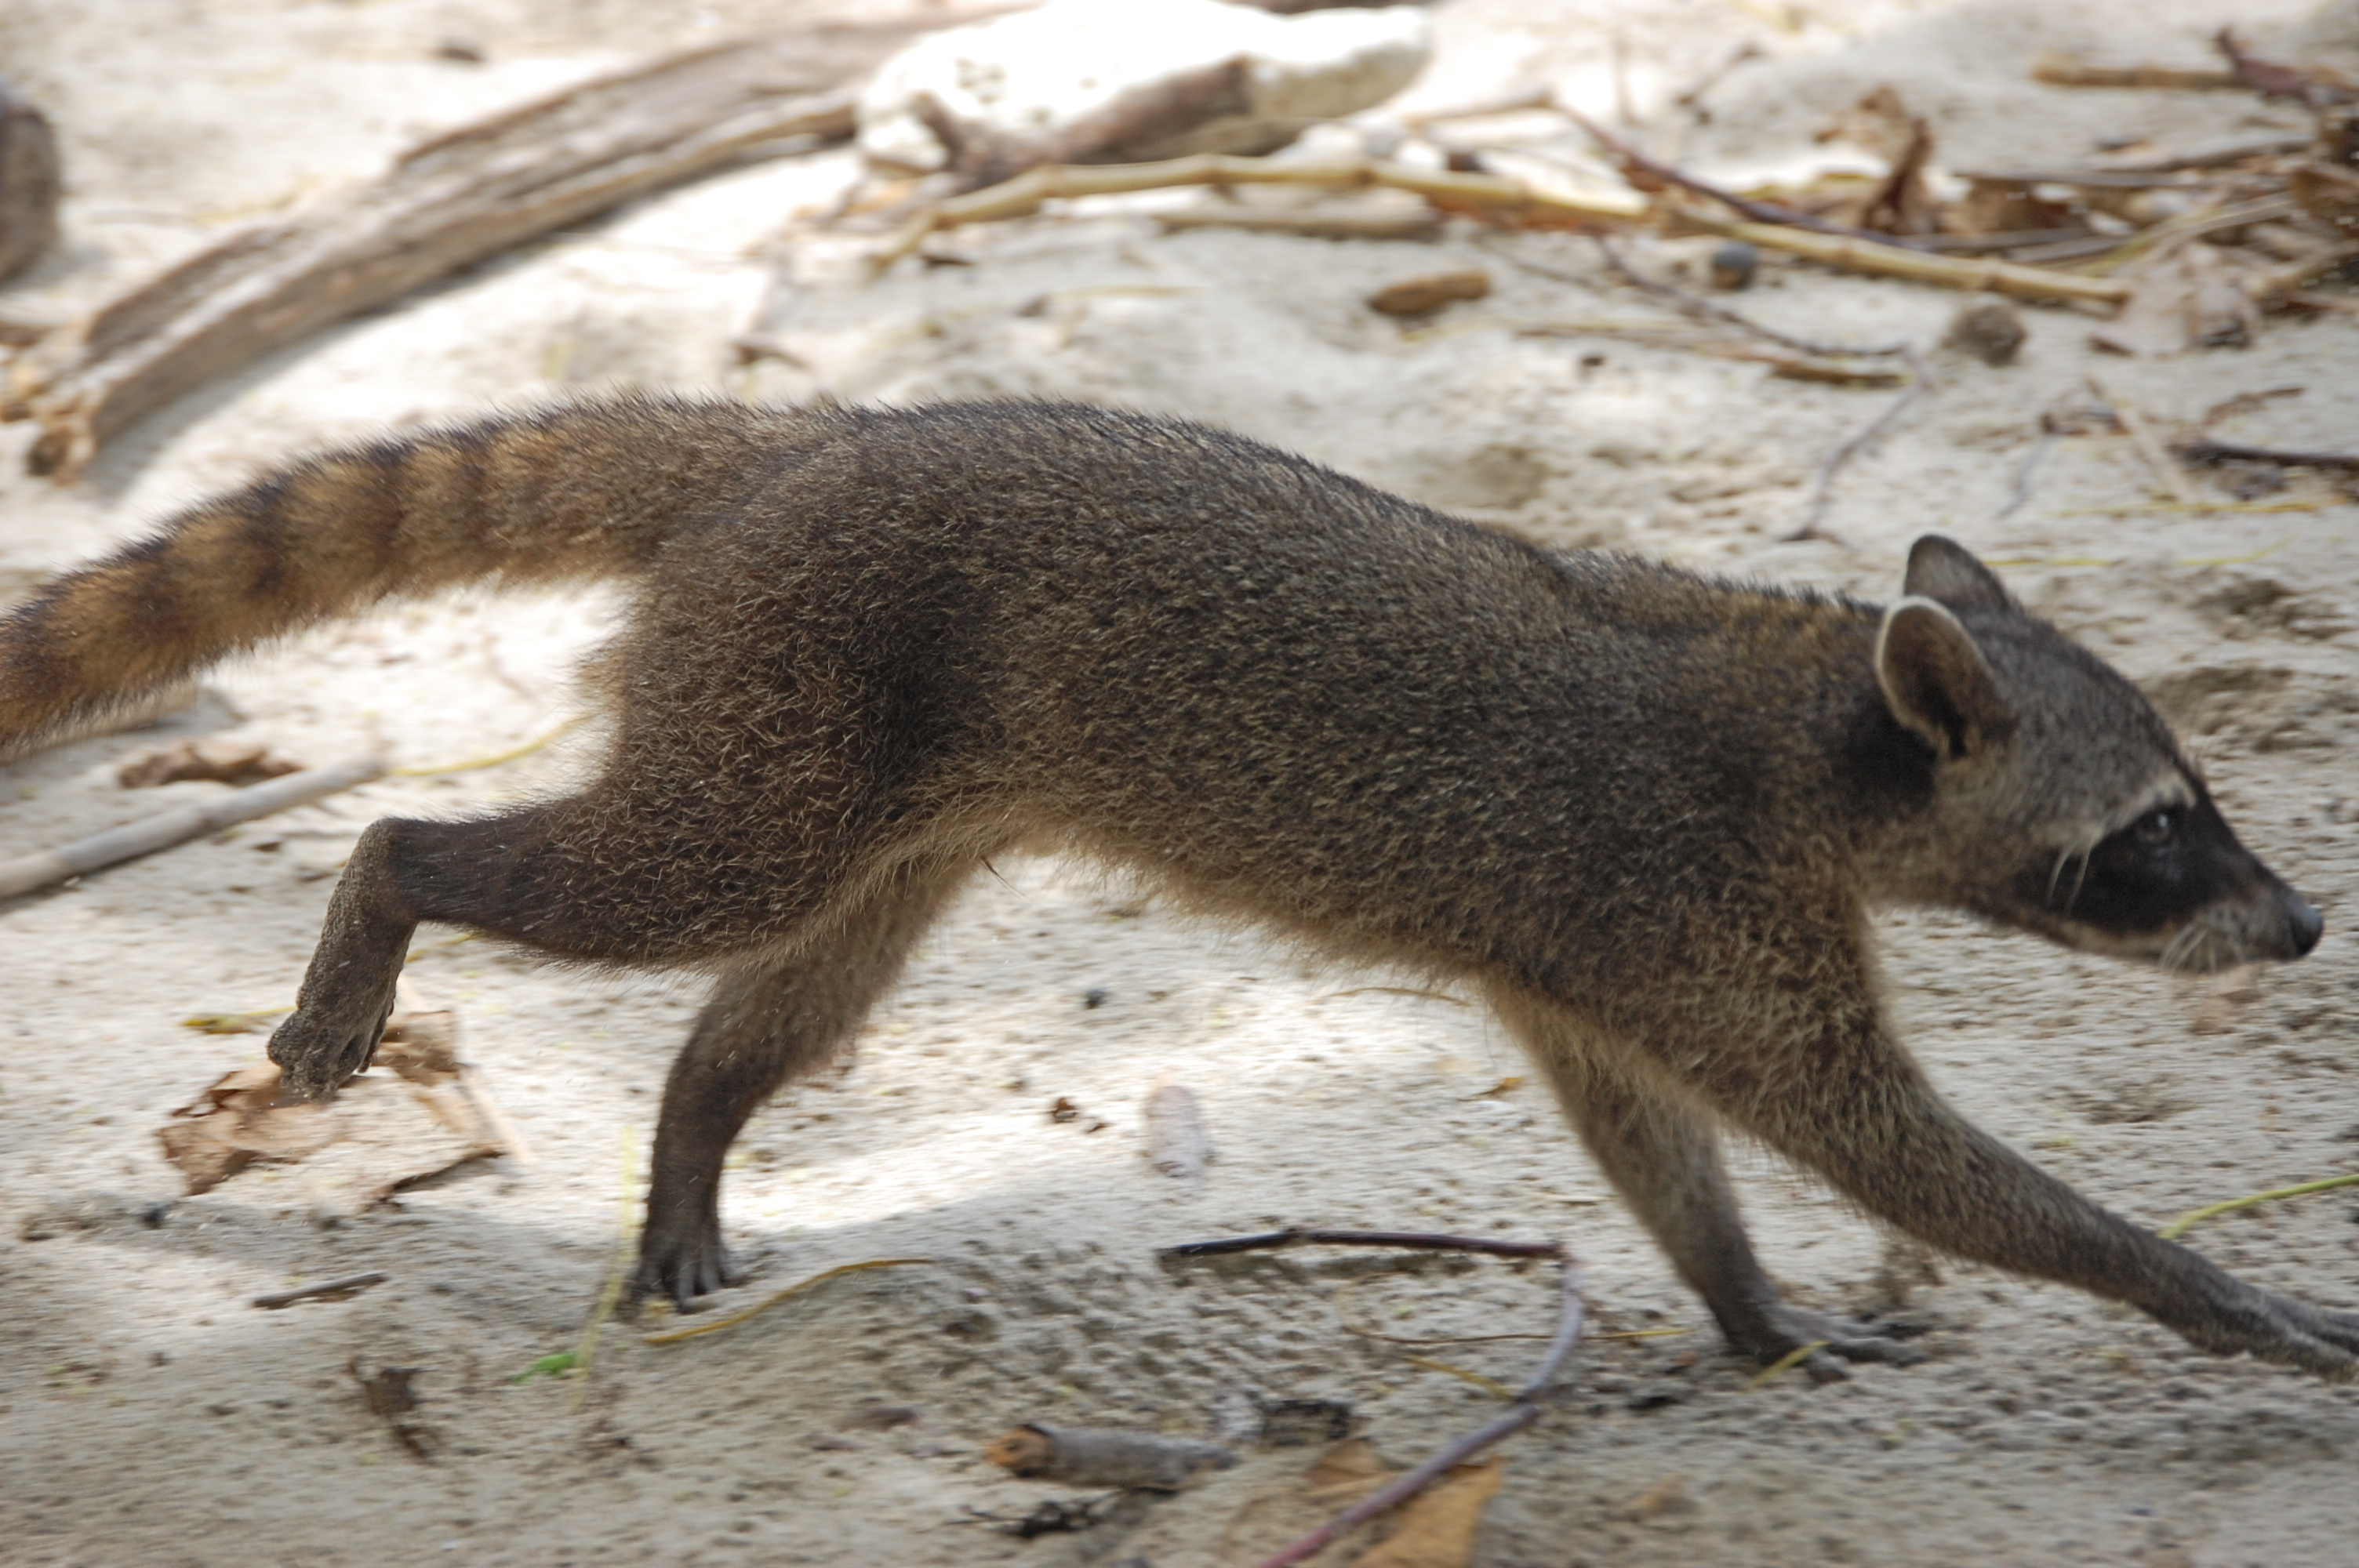 Crab-eating raccoon (Procyon cancrivorus) in Manuel Antonio National Park, Costa Rica. By Steven G. Johnson